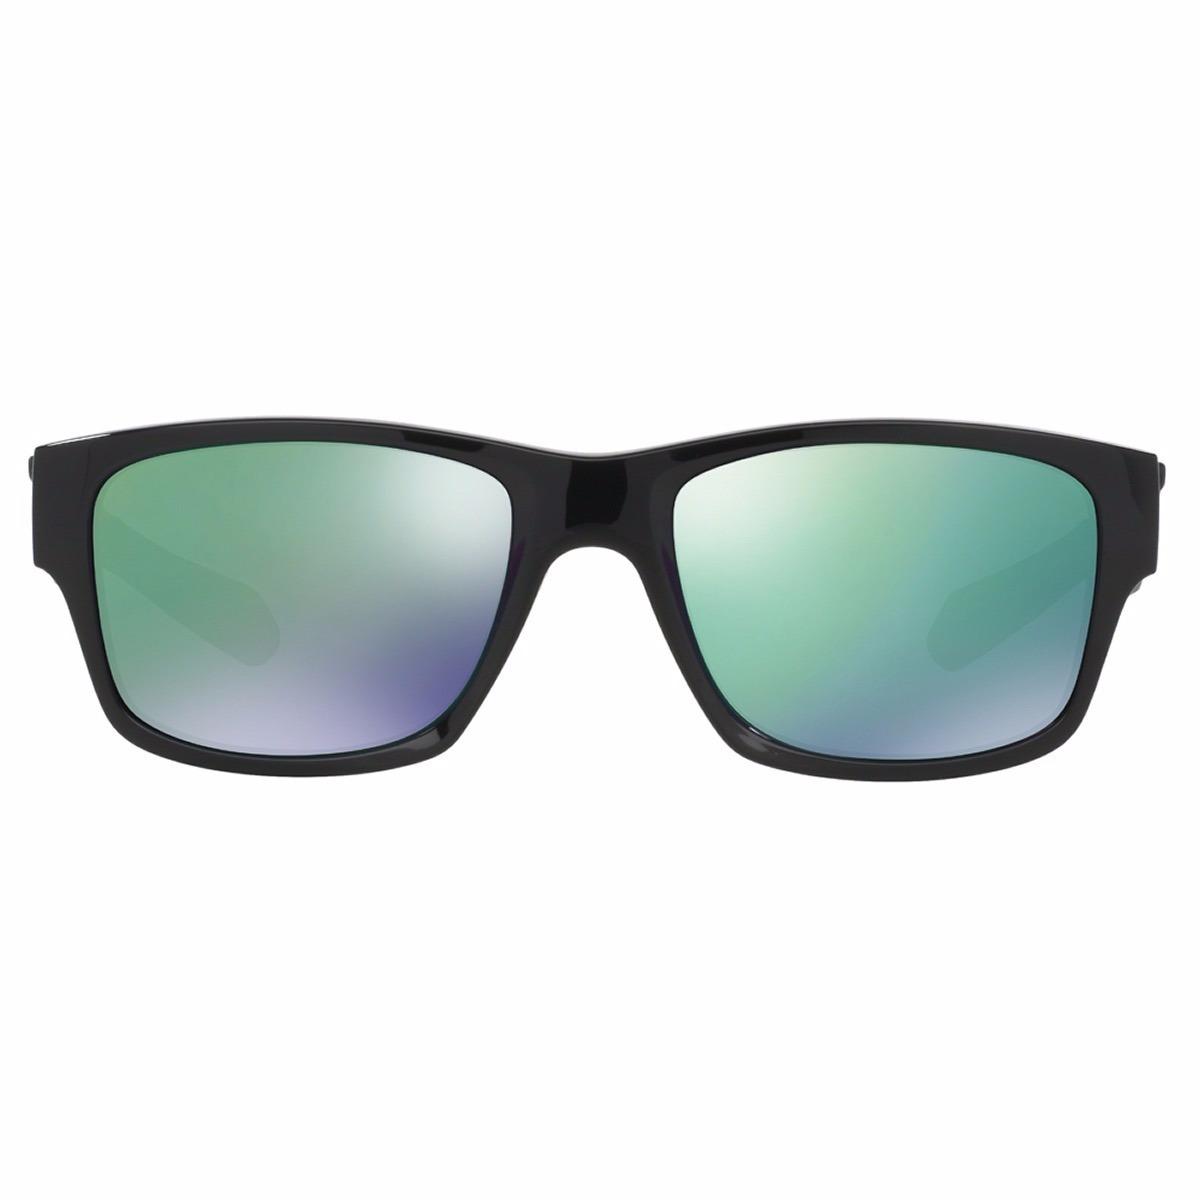 bf37b7ff98 lentes oakley jupiter squared polished black / jade iridium. Cargando zoom.